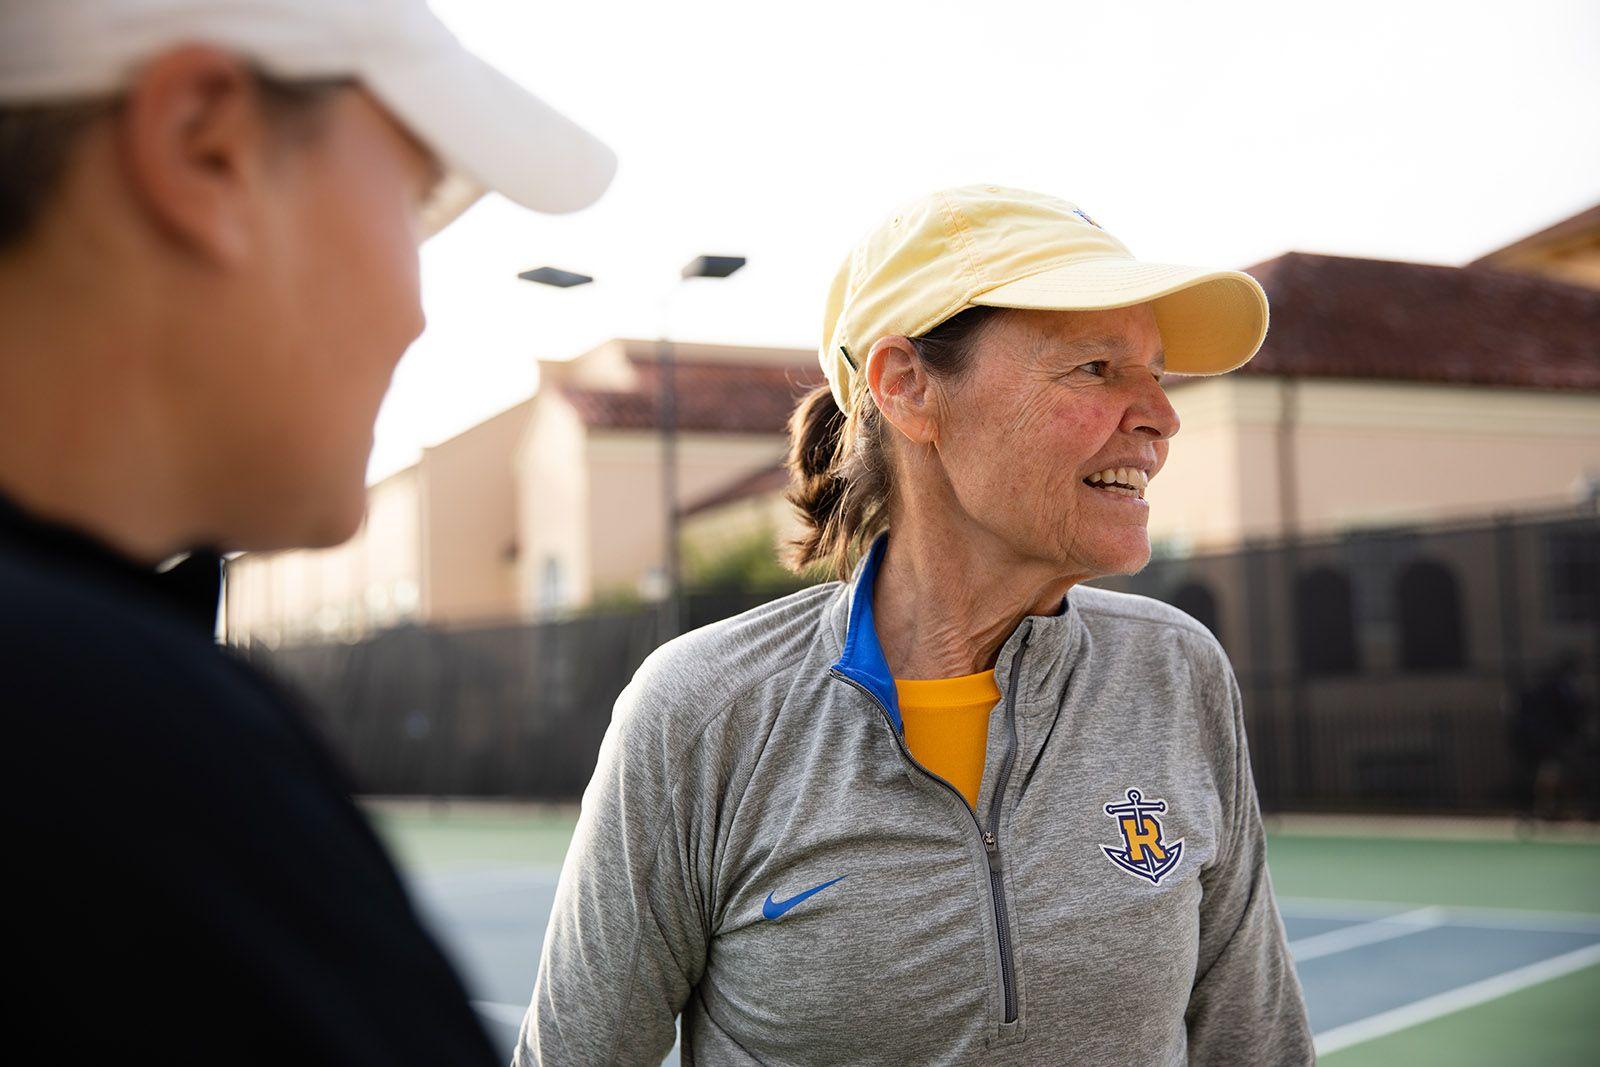 Kaiser and Hutnick on a tennis court.